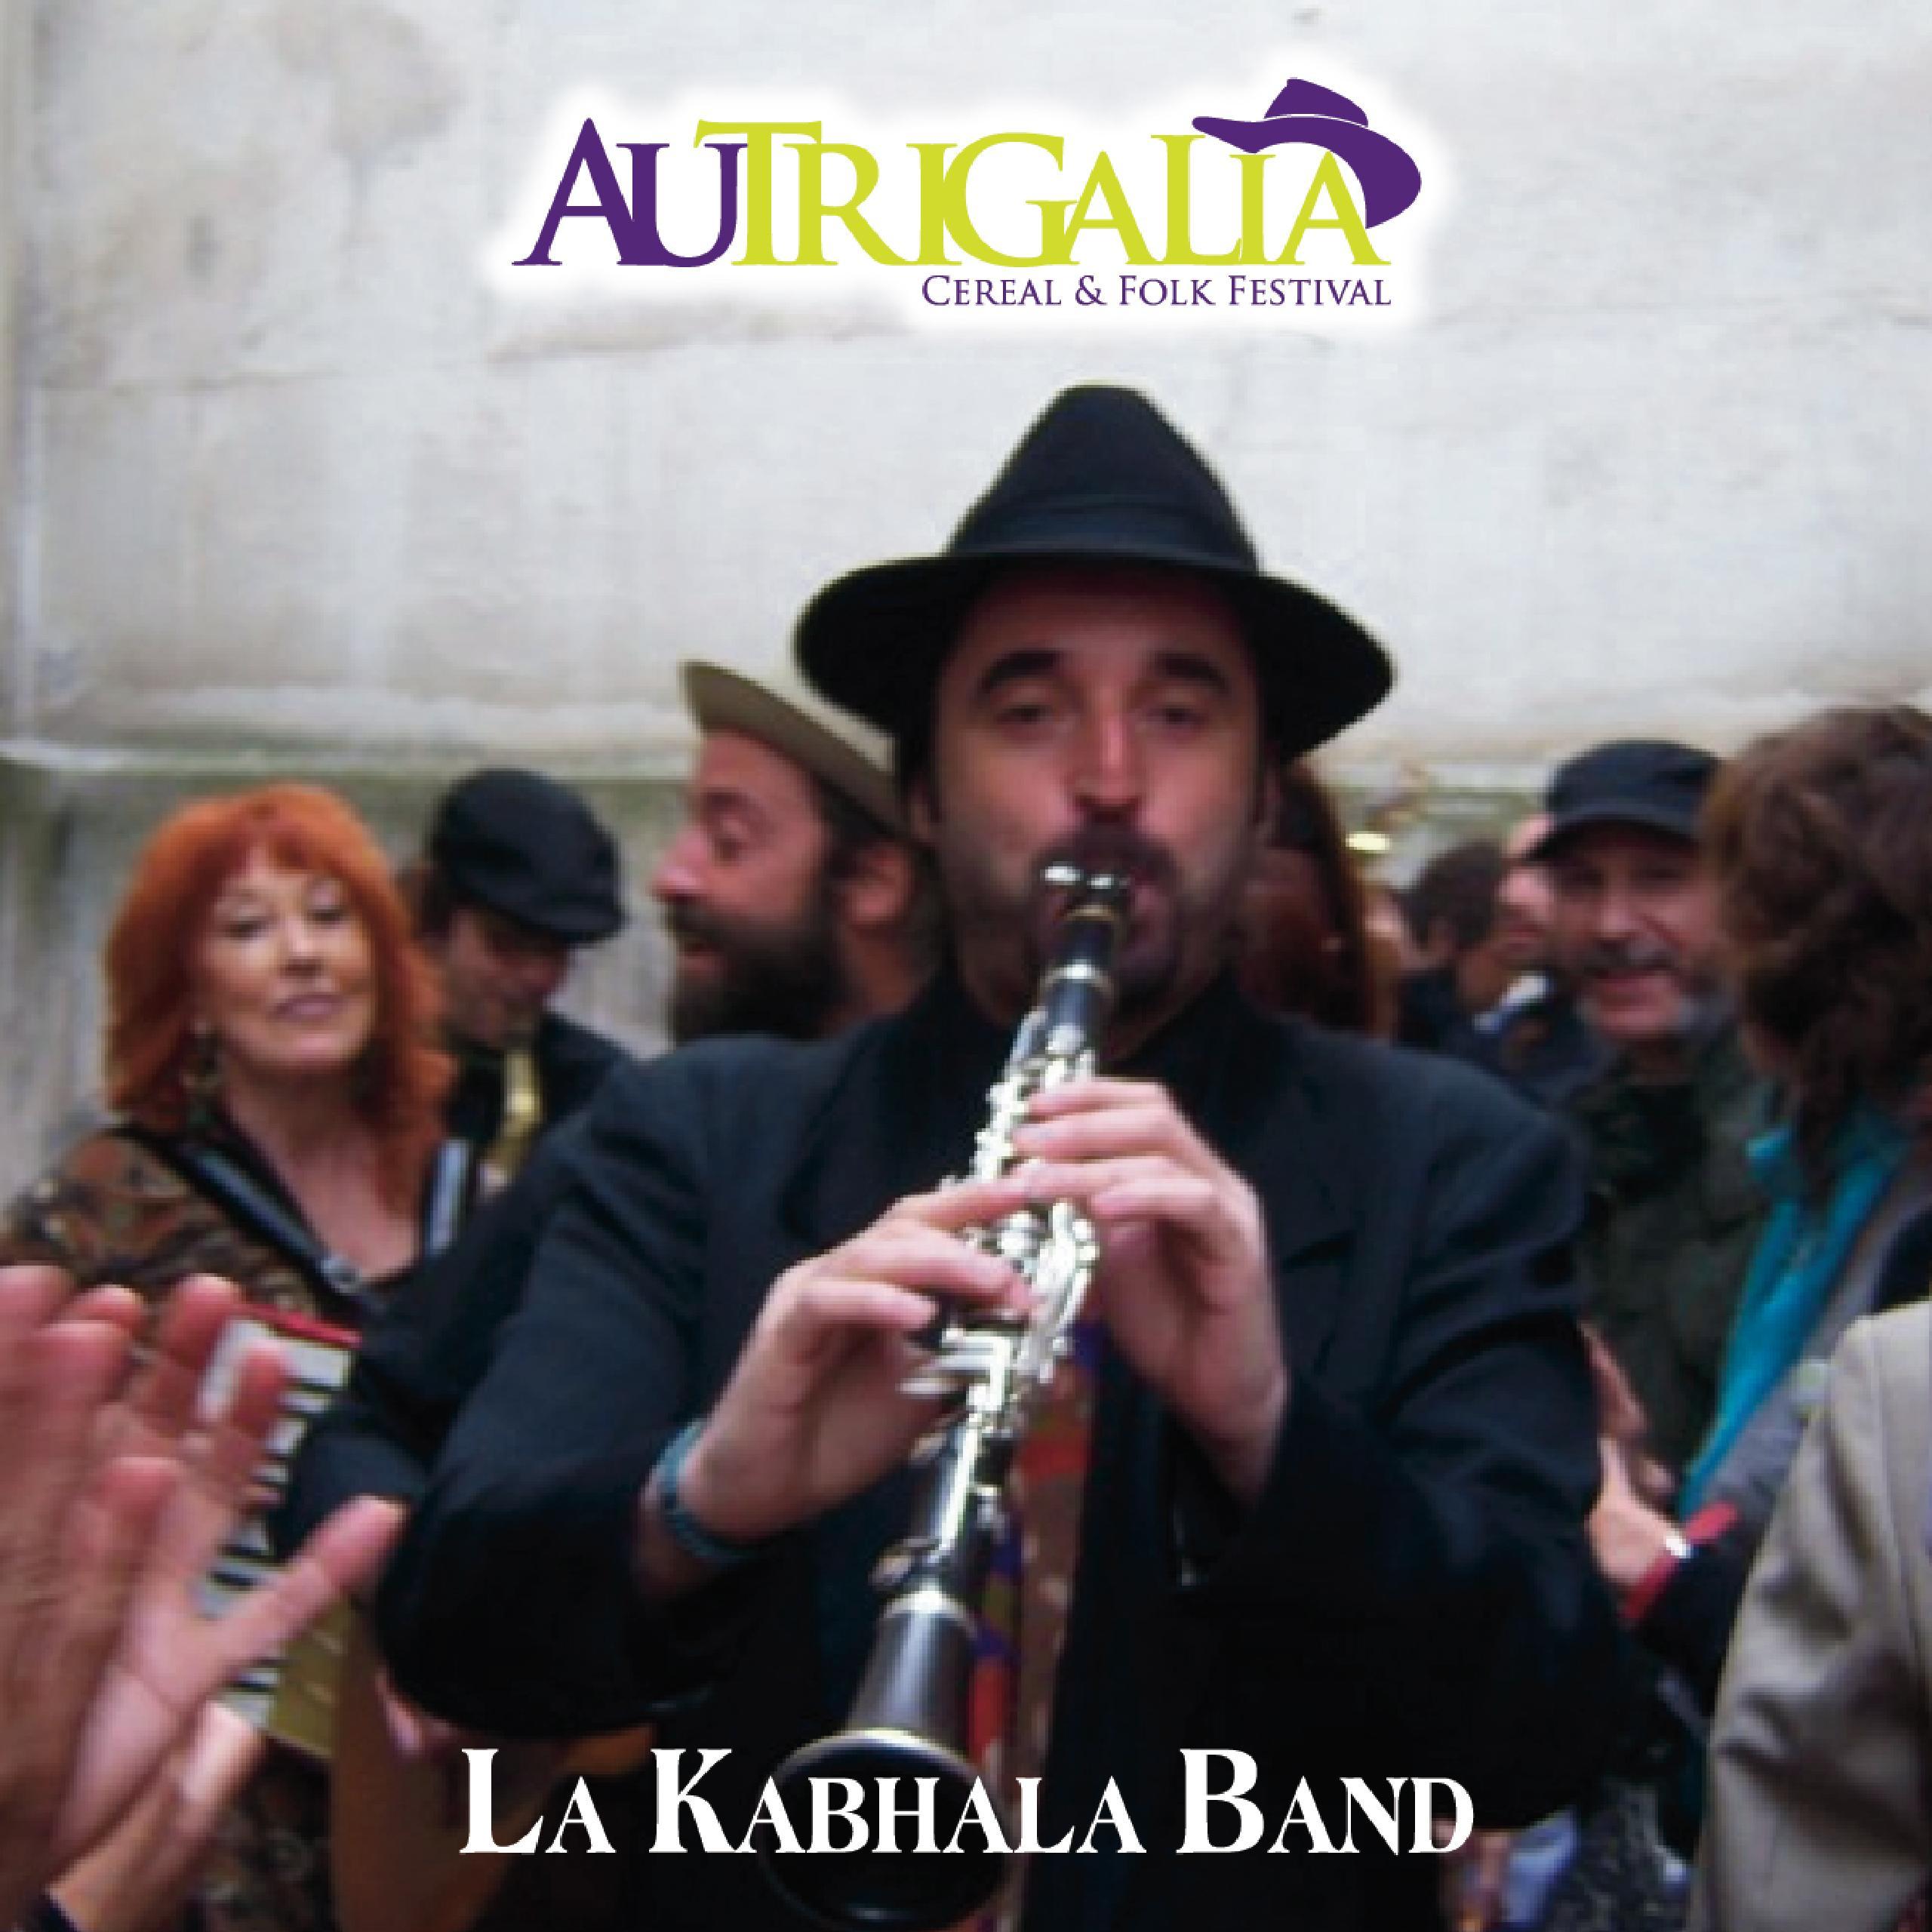 La Kabhala Band